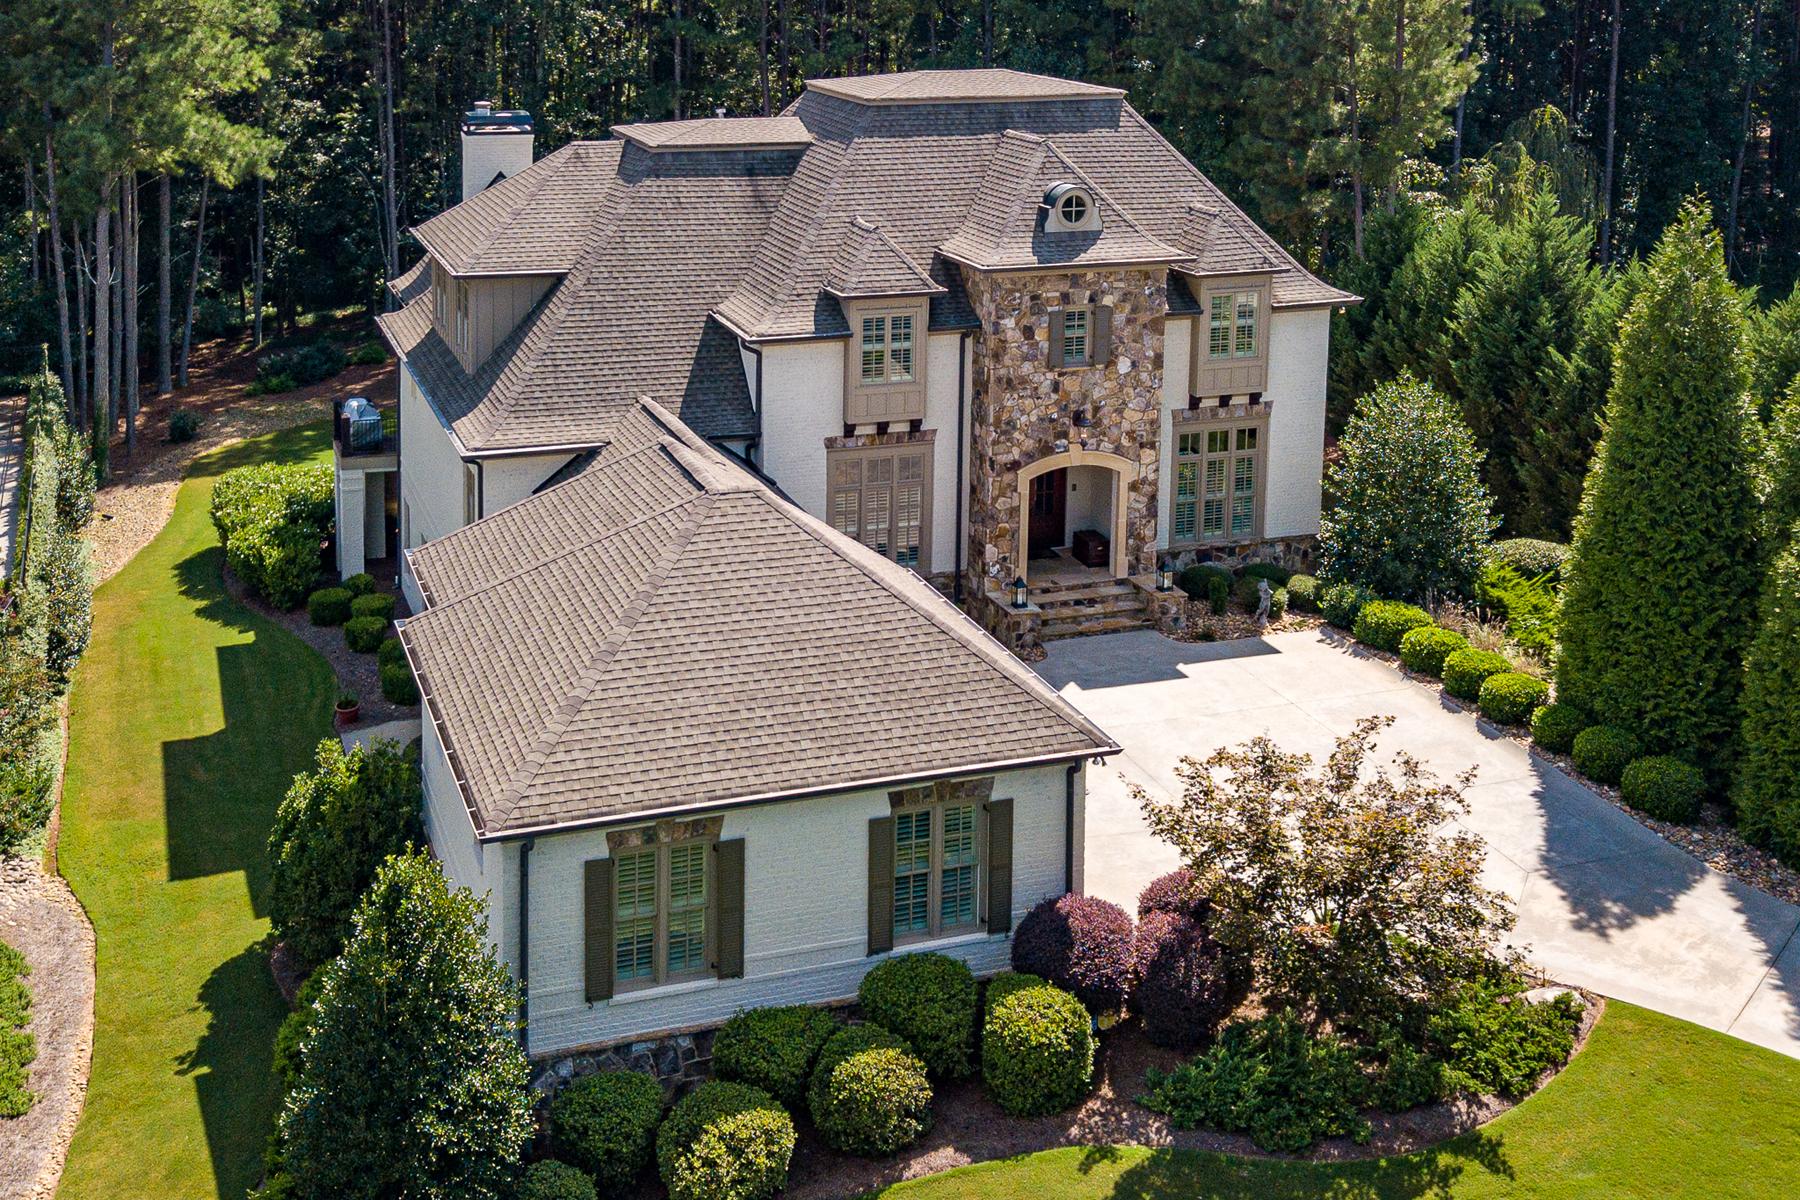 Single Family Homes für Verkauf beim Desirable Newhaven Home 185 Newhaven Drive, Fayetteville, Georgia 30215 Vereinigte Staaten